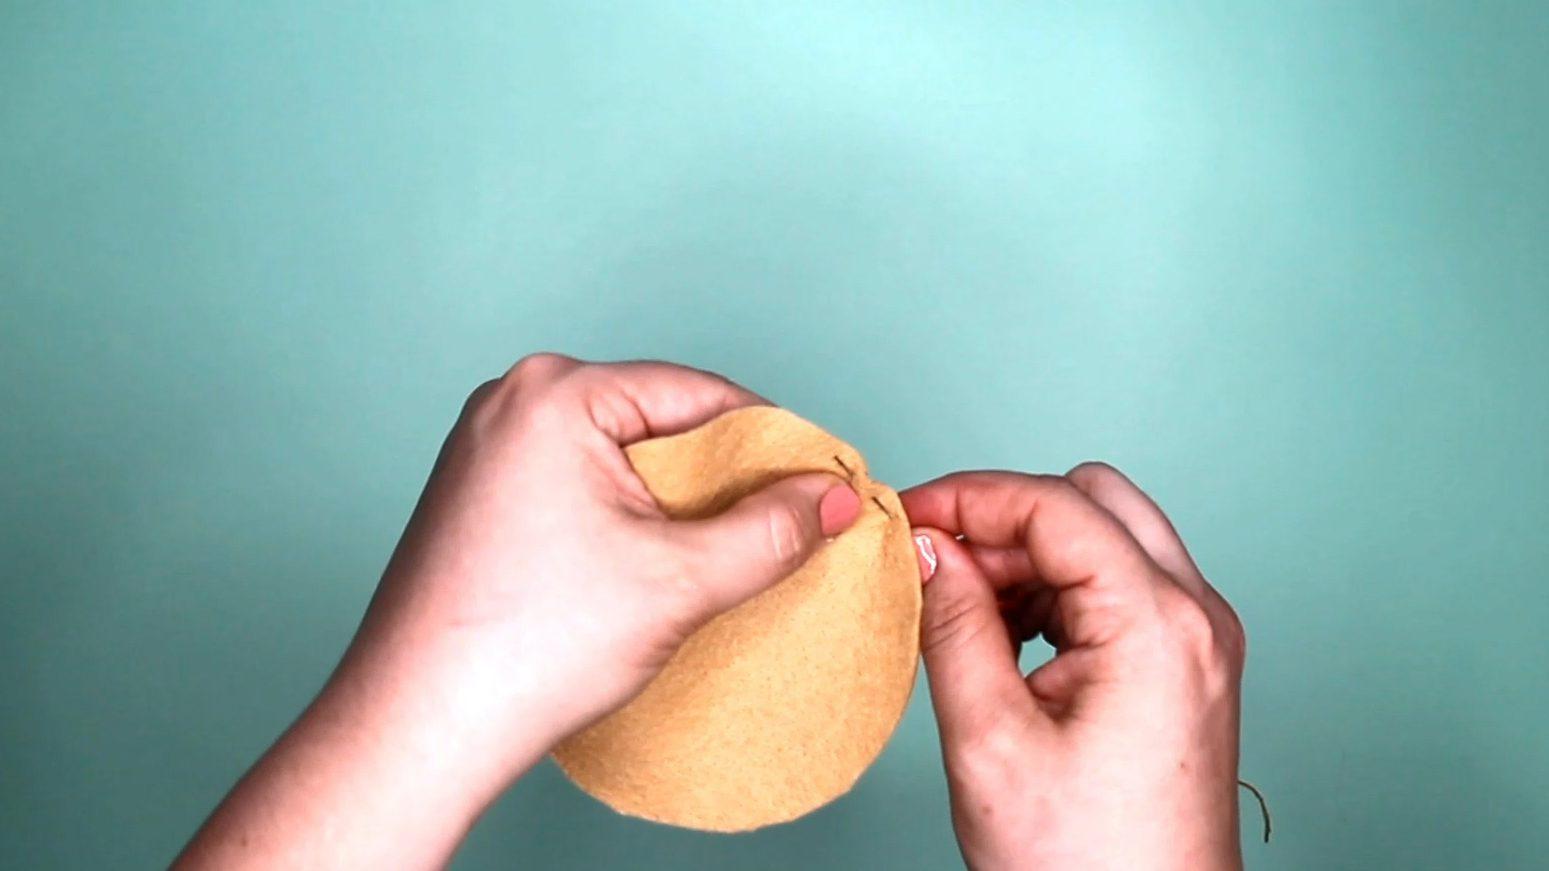 DIY Felt Play Food: step 2a